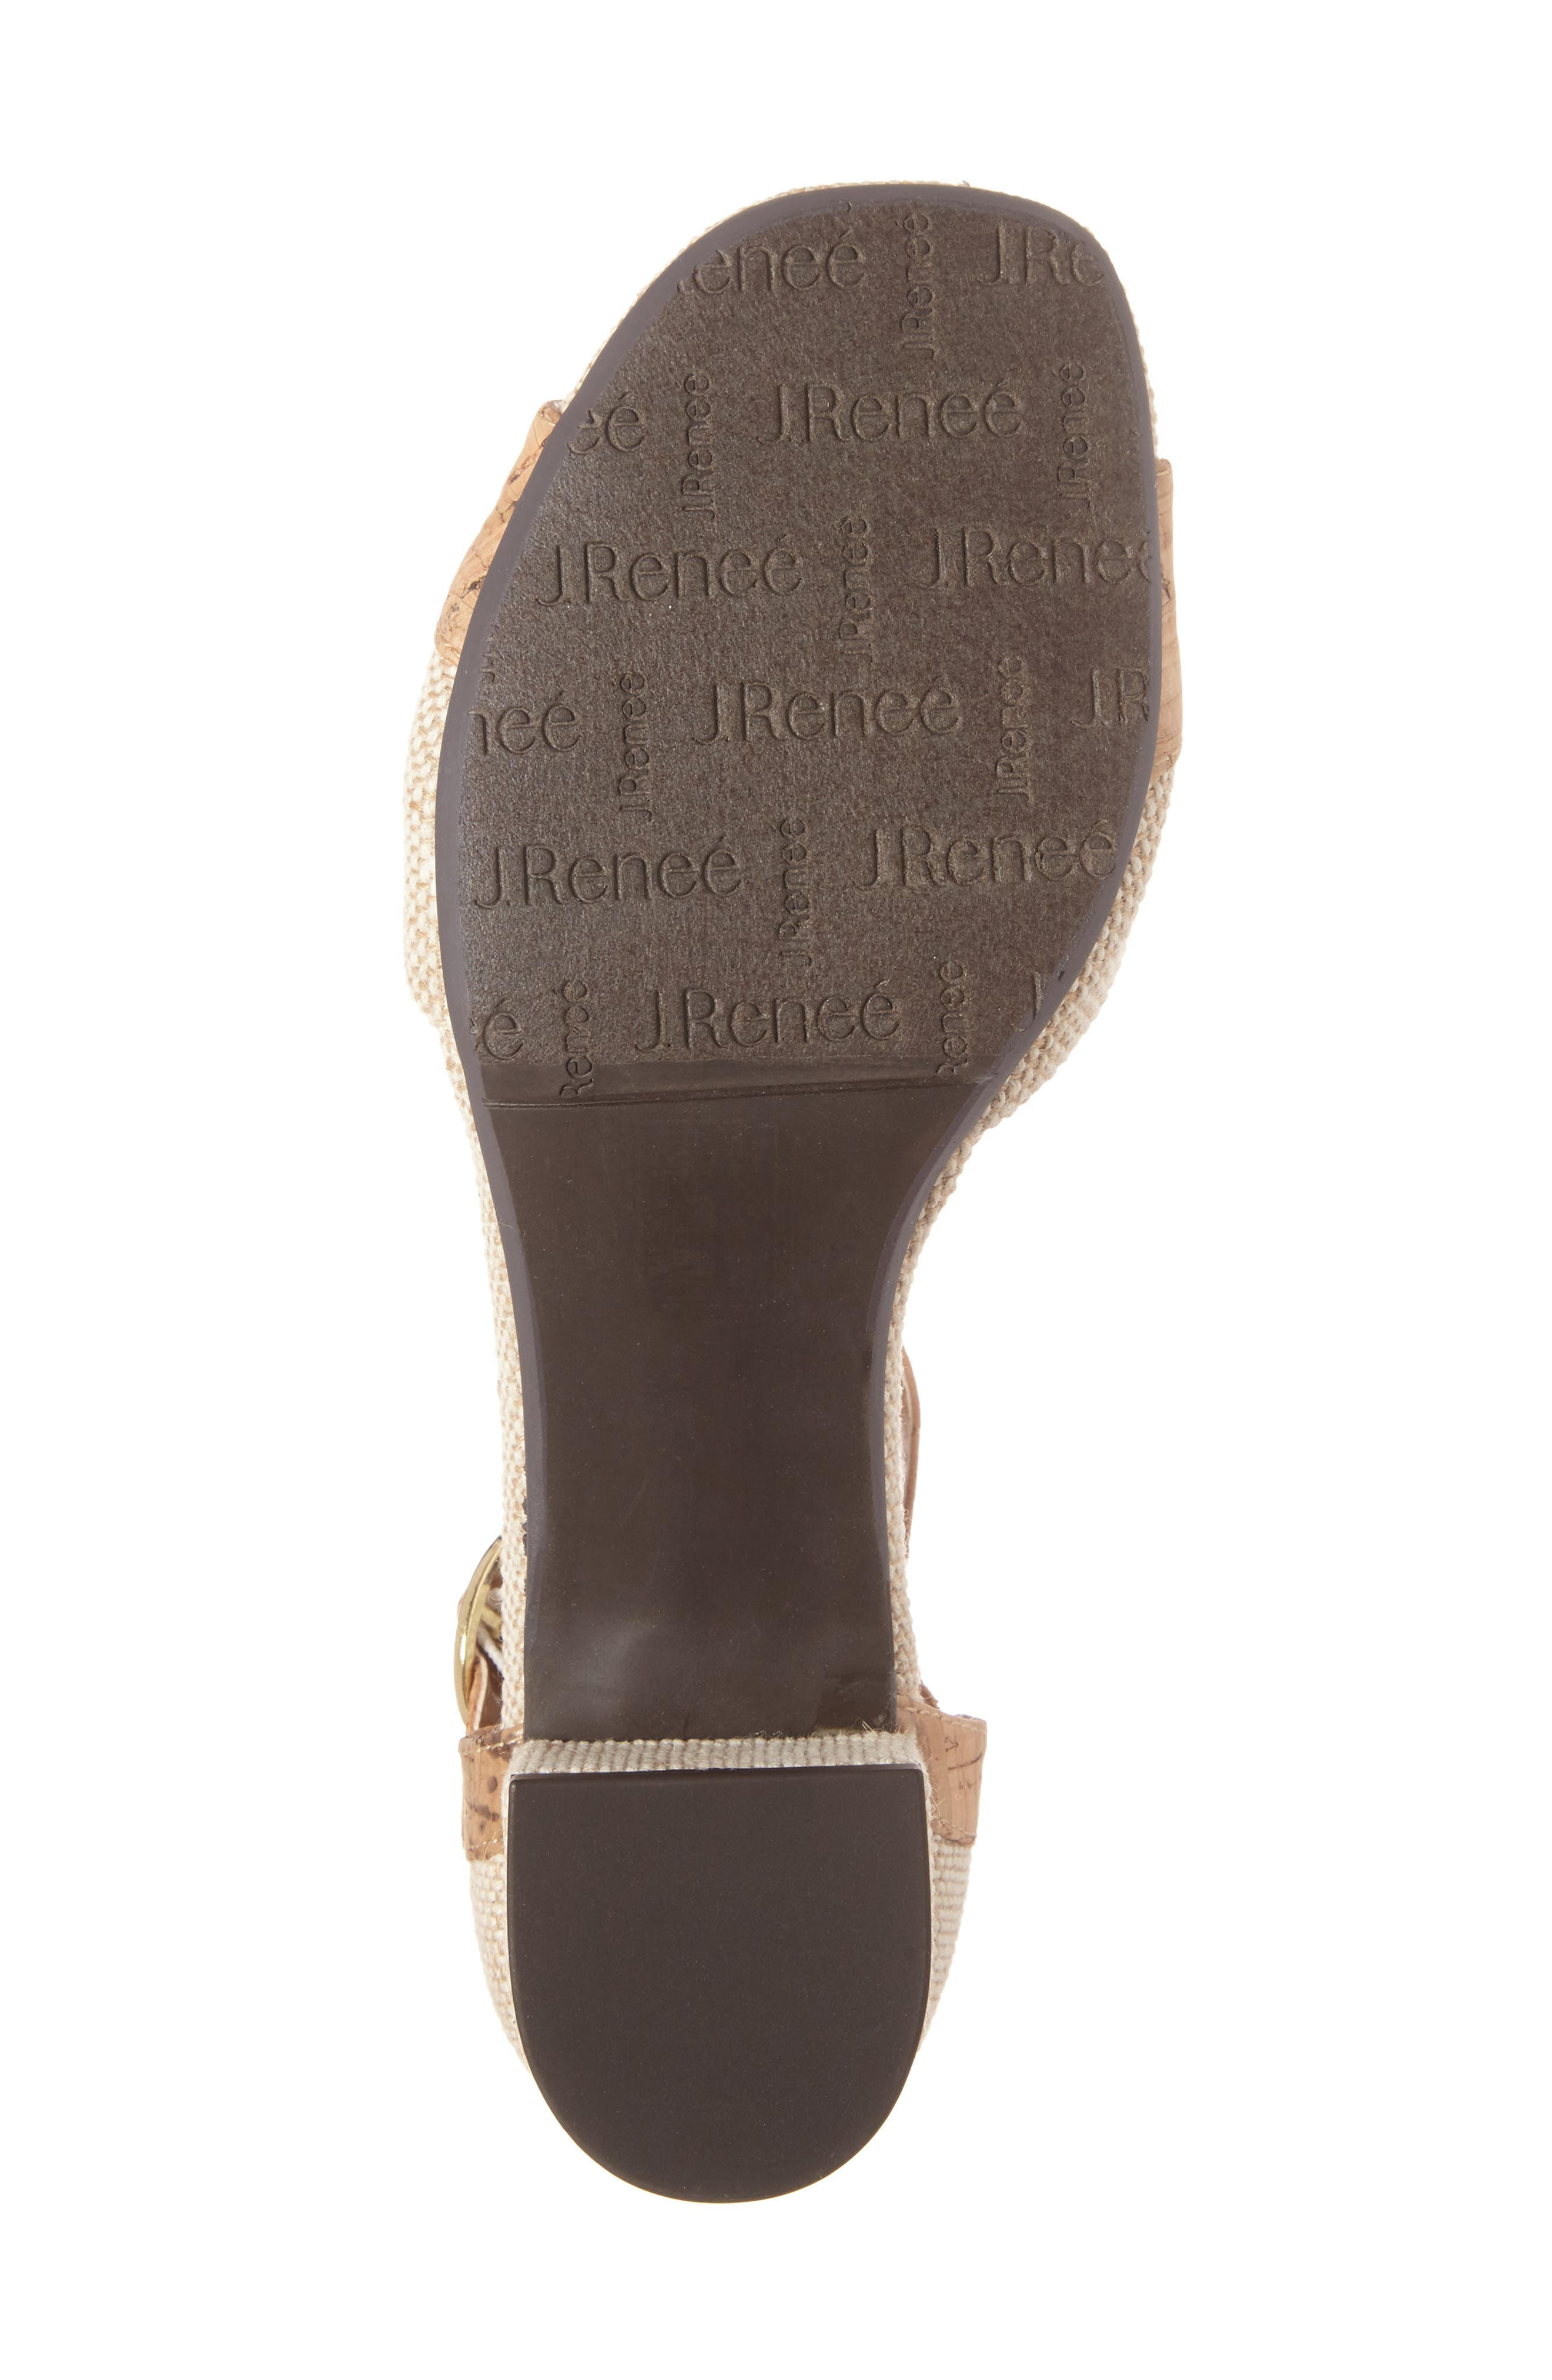 Pebblebeach Block Heel Sandal,                             Alternate thumbnail 4, color,                             Natural/ Cork Fabric